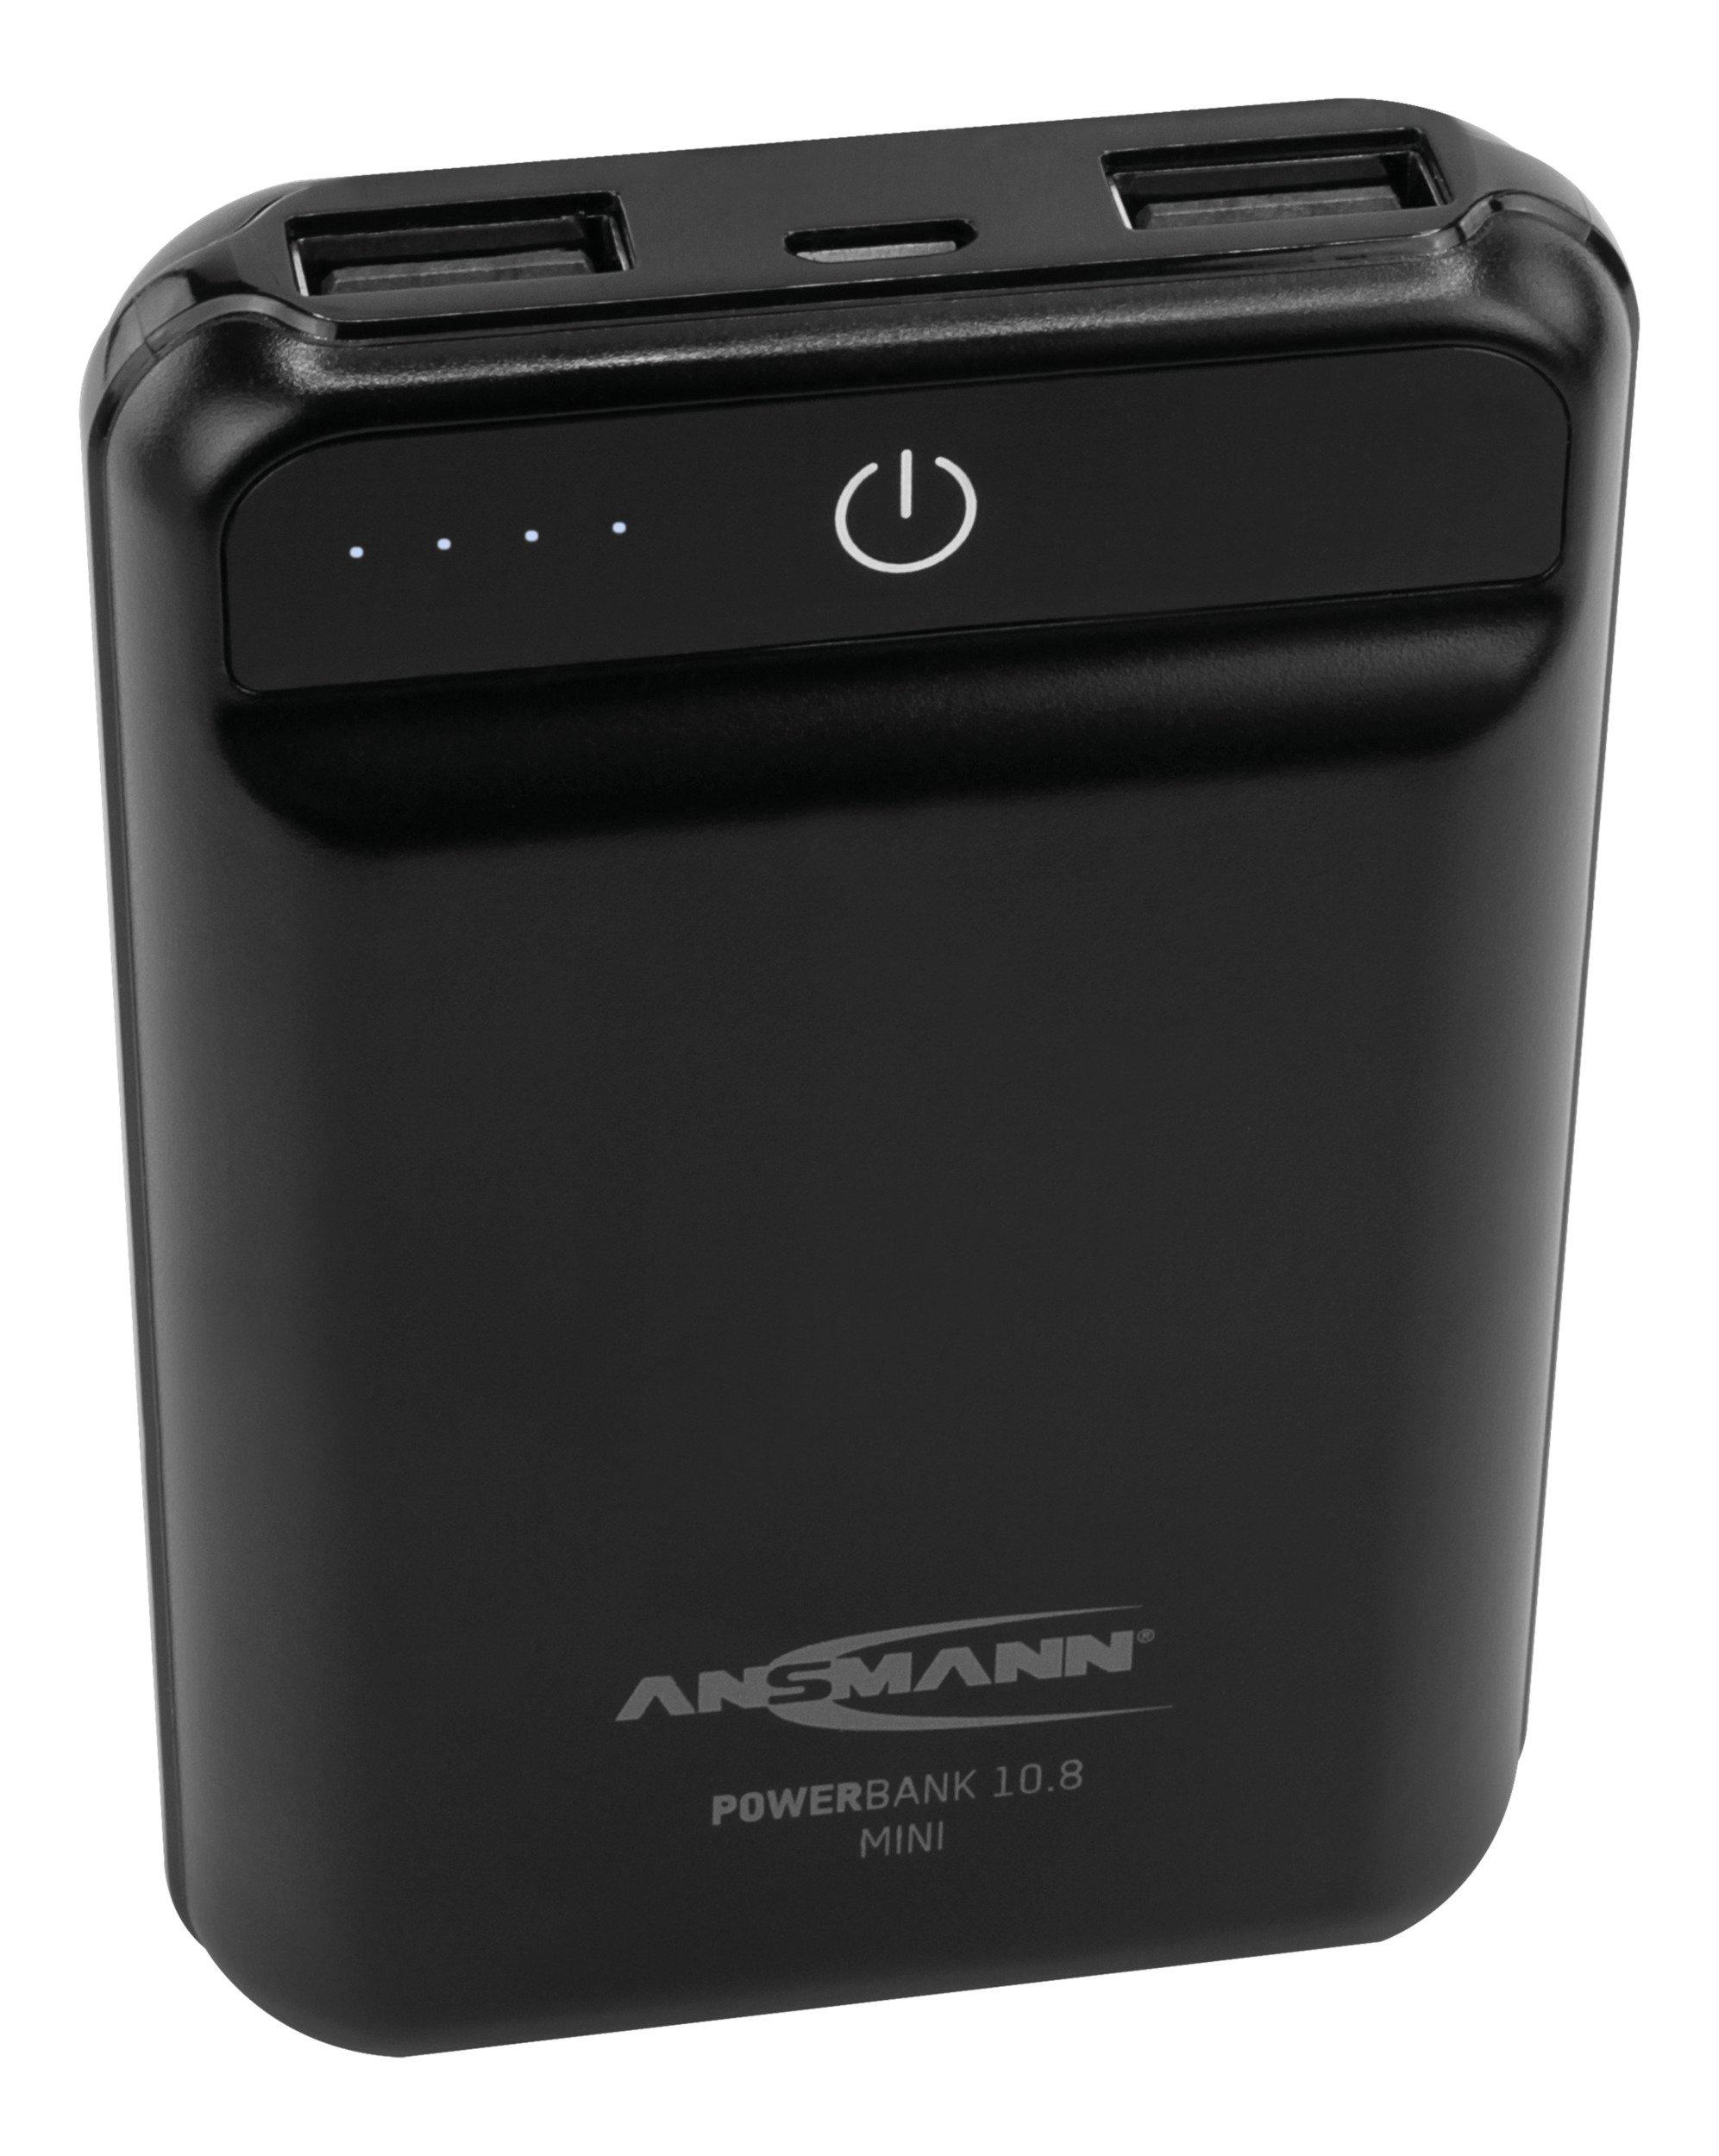 Ansmann Powerbank 10.8 mini -  Beste prijs - kwaliteitverhouding!